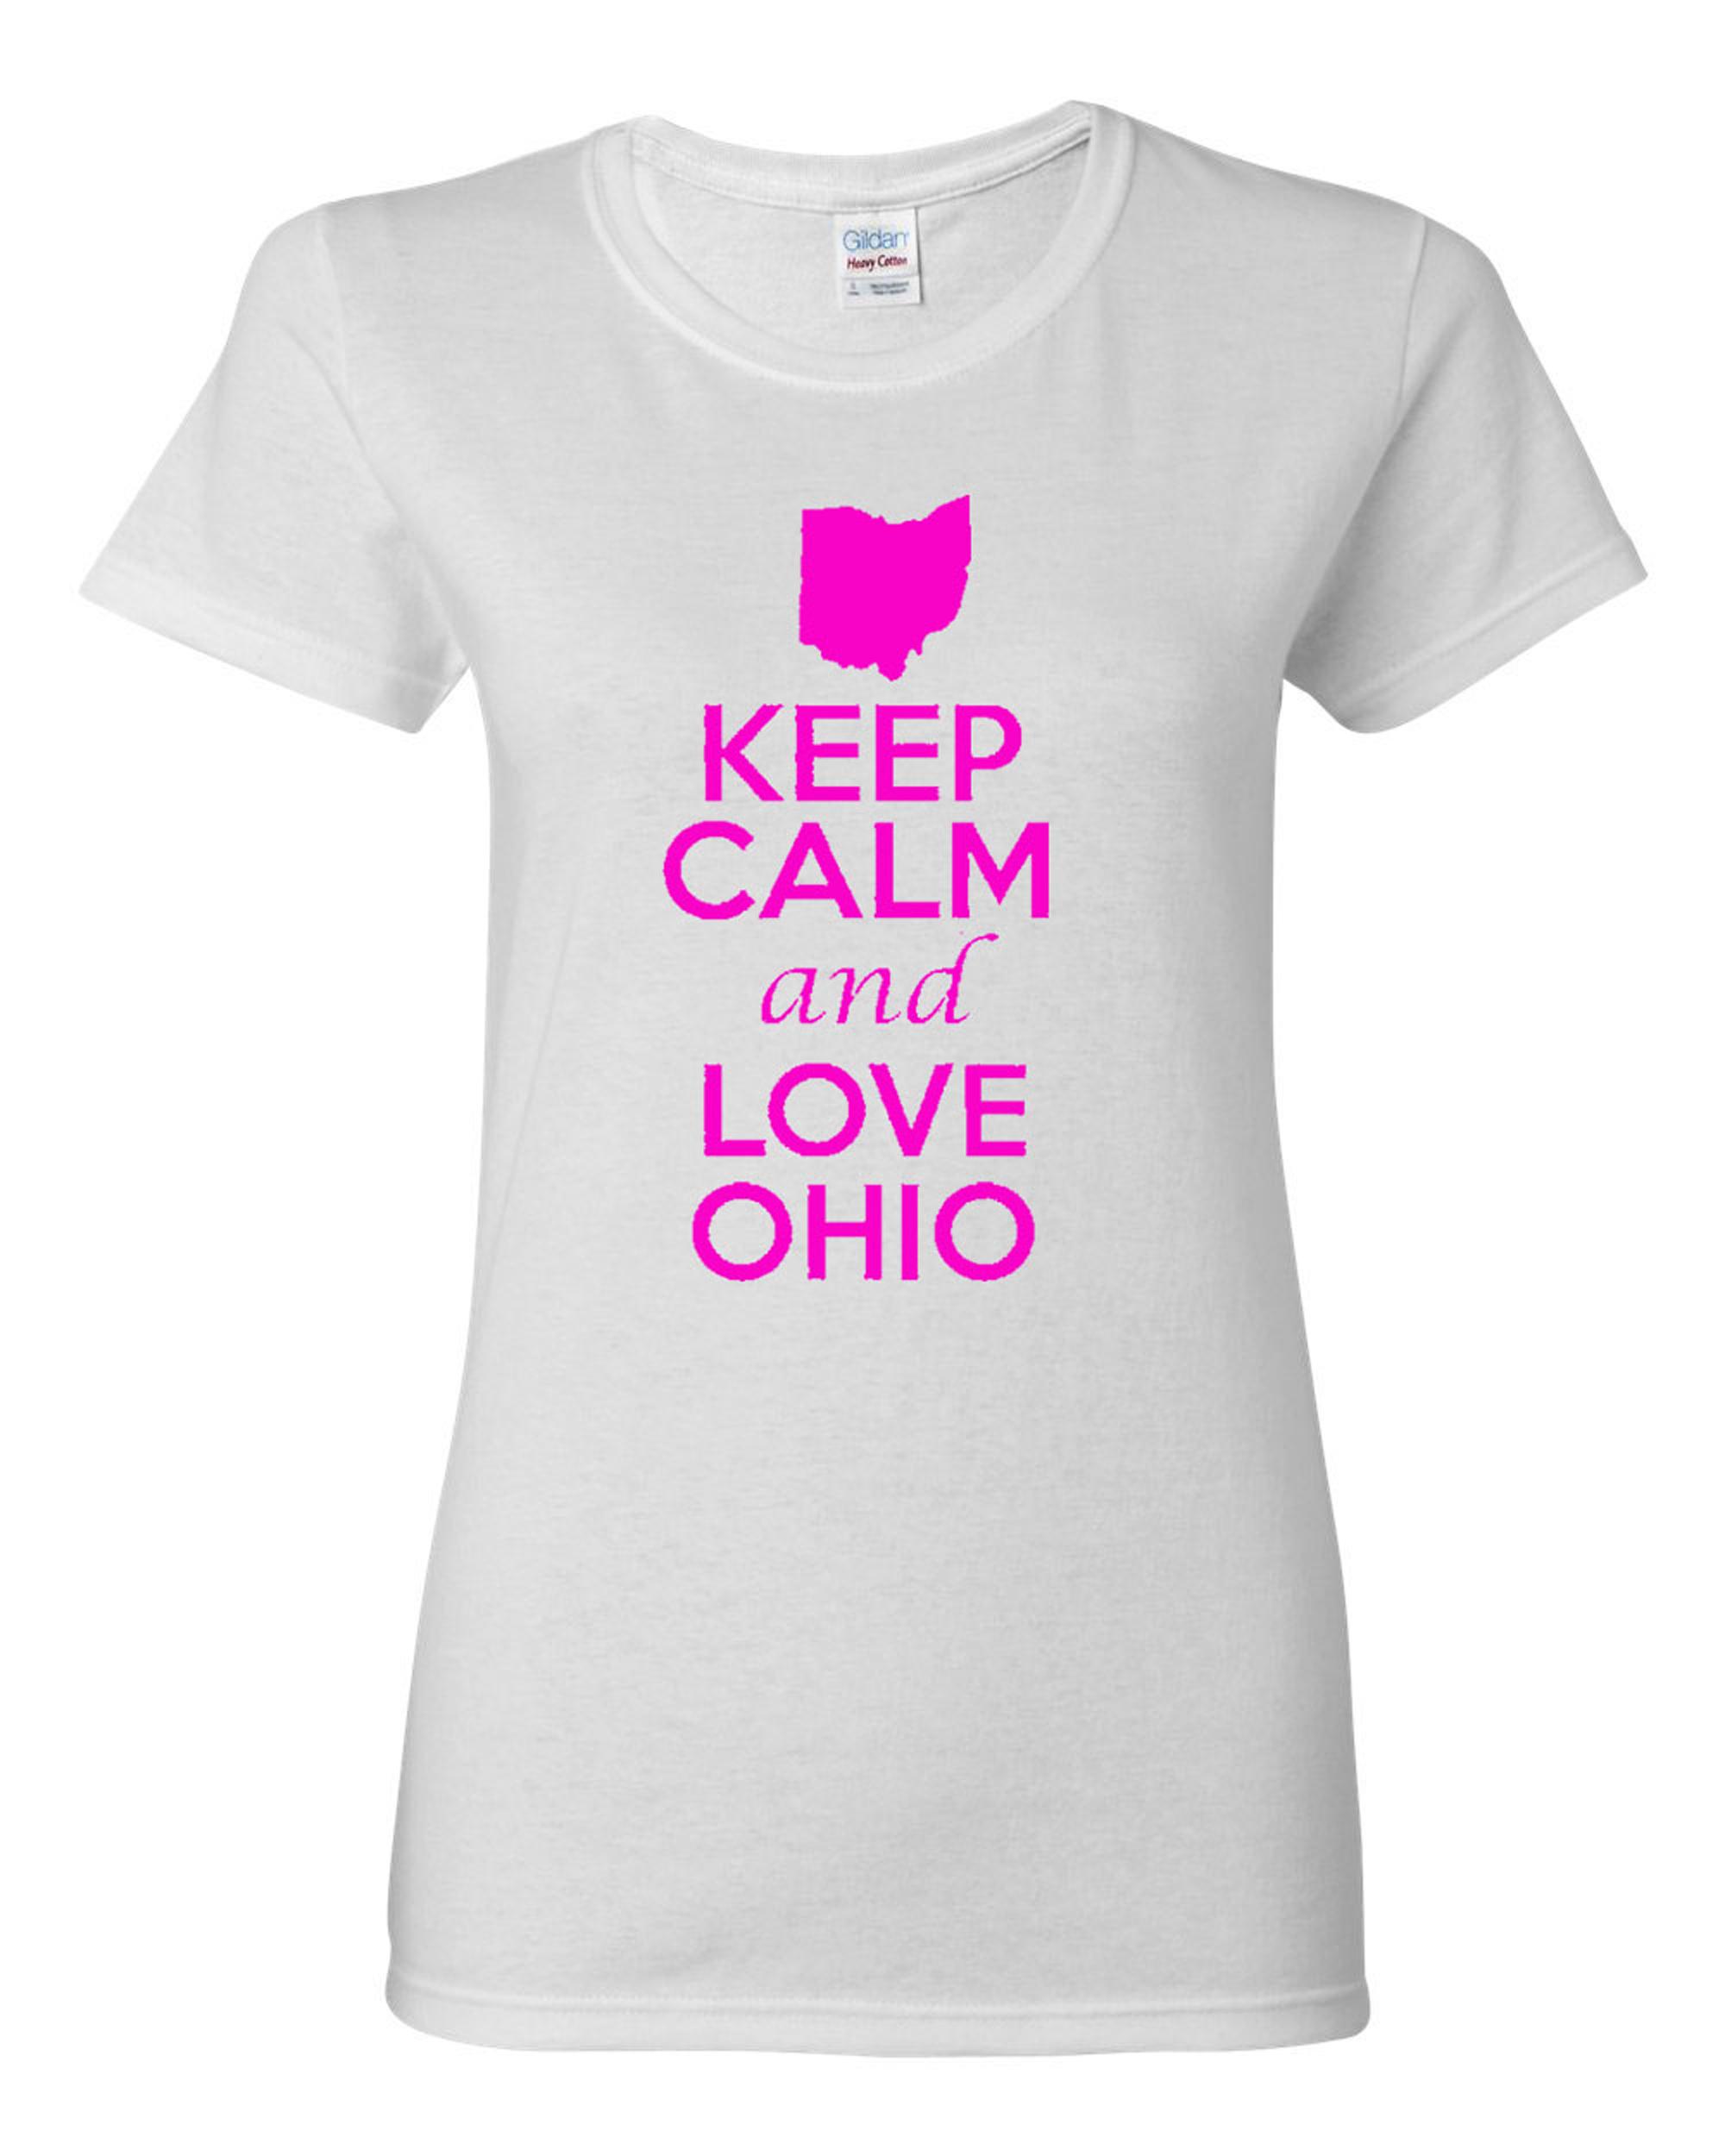 Ladies Keep Calm And Love Ohio Country T-Shirt Tee